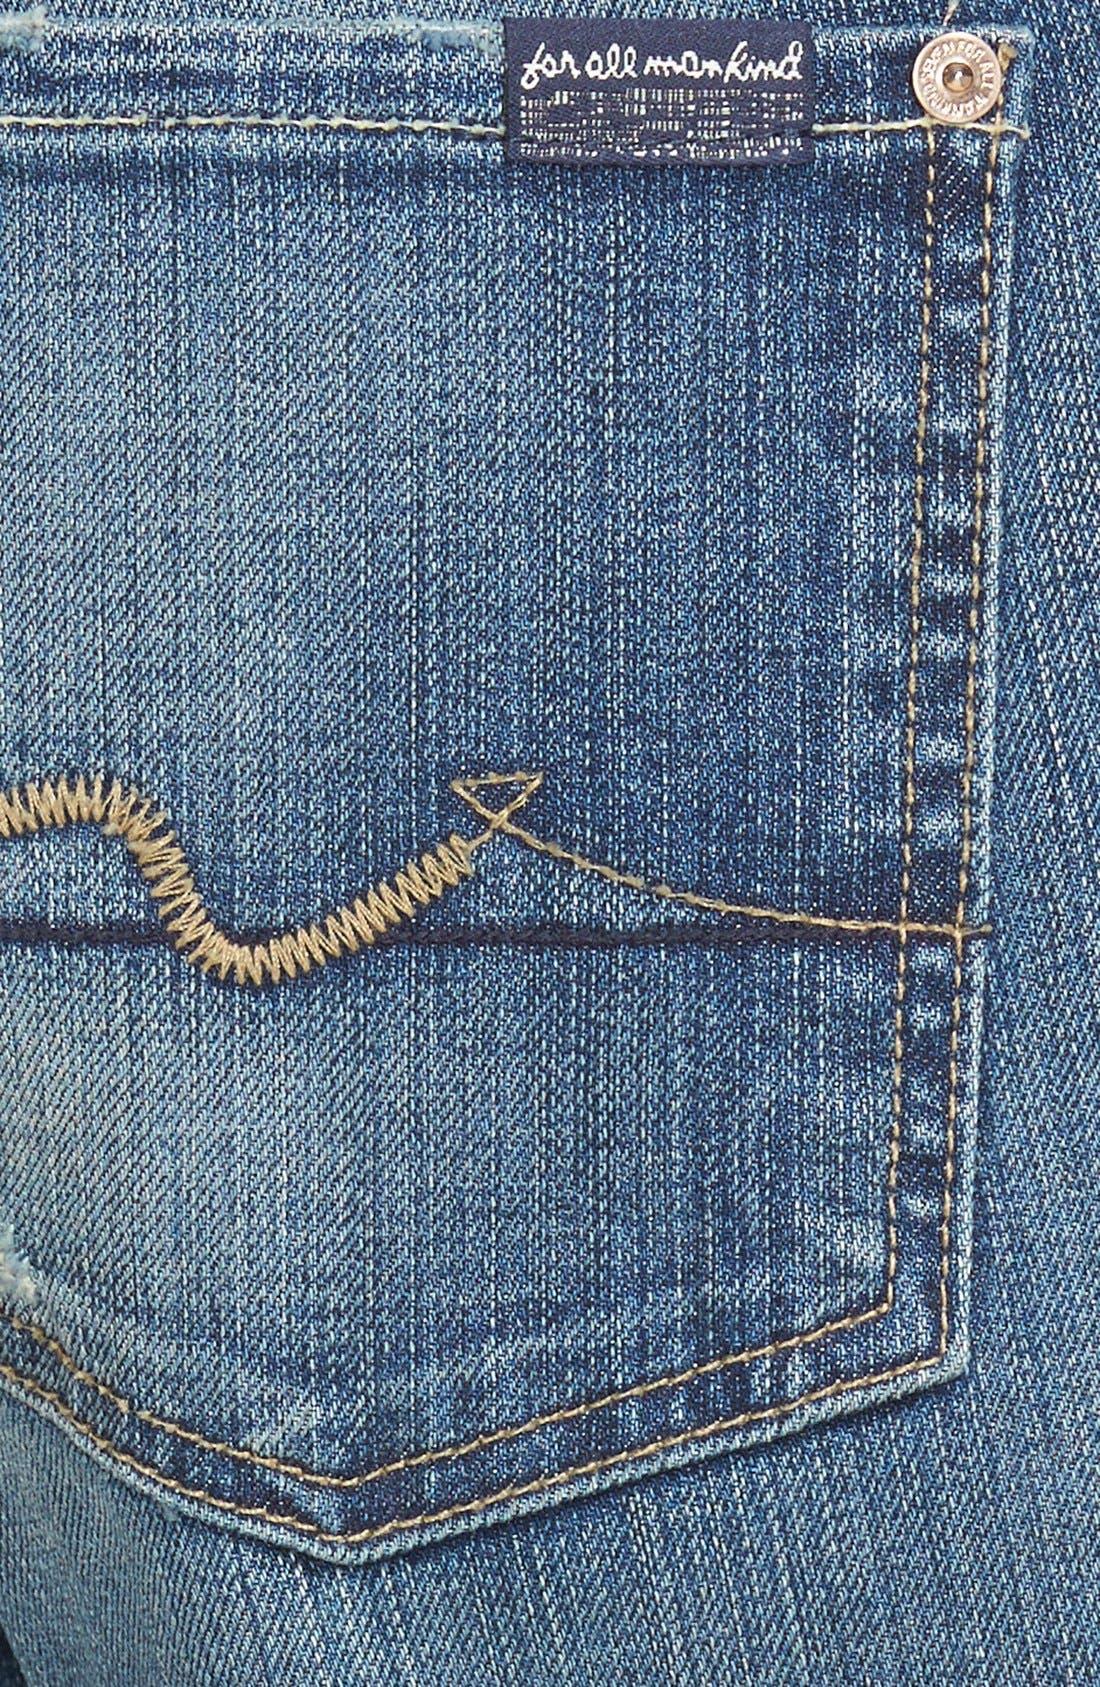 Alternate Image 3  - 7 For All Mankind® 'Josefina' Boyfriend Jeans (Dusty Vintage Blue)